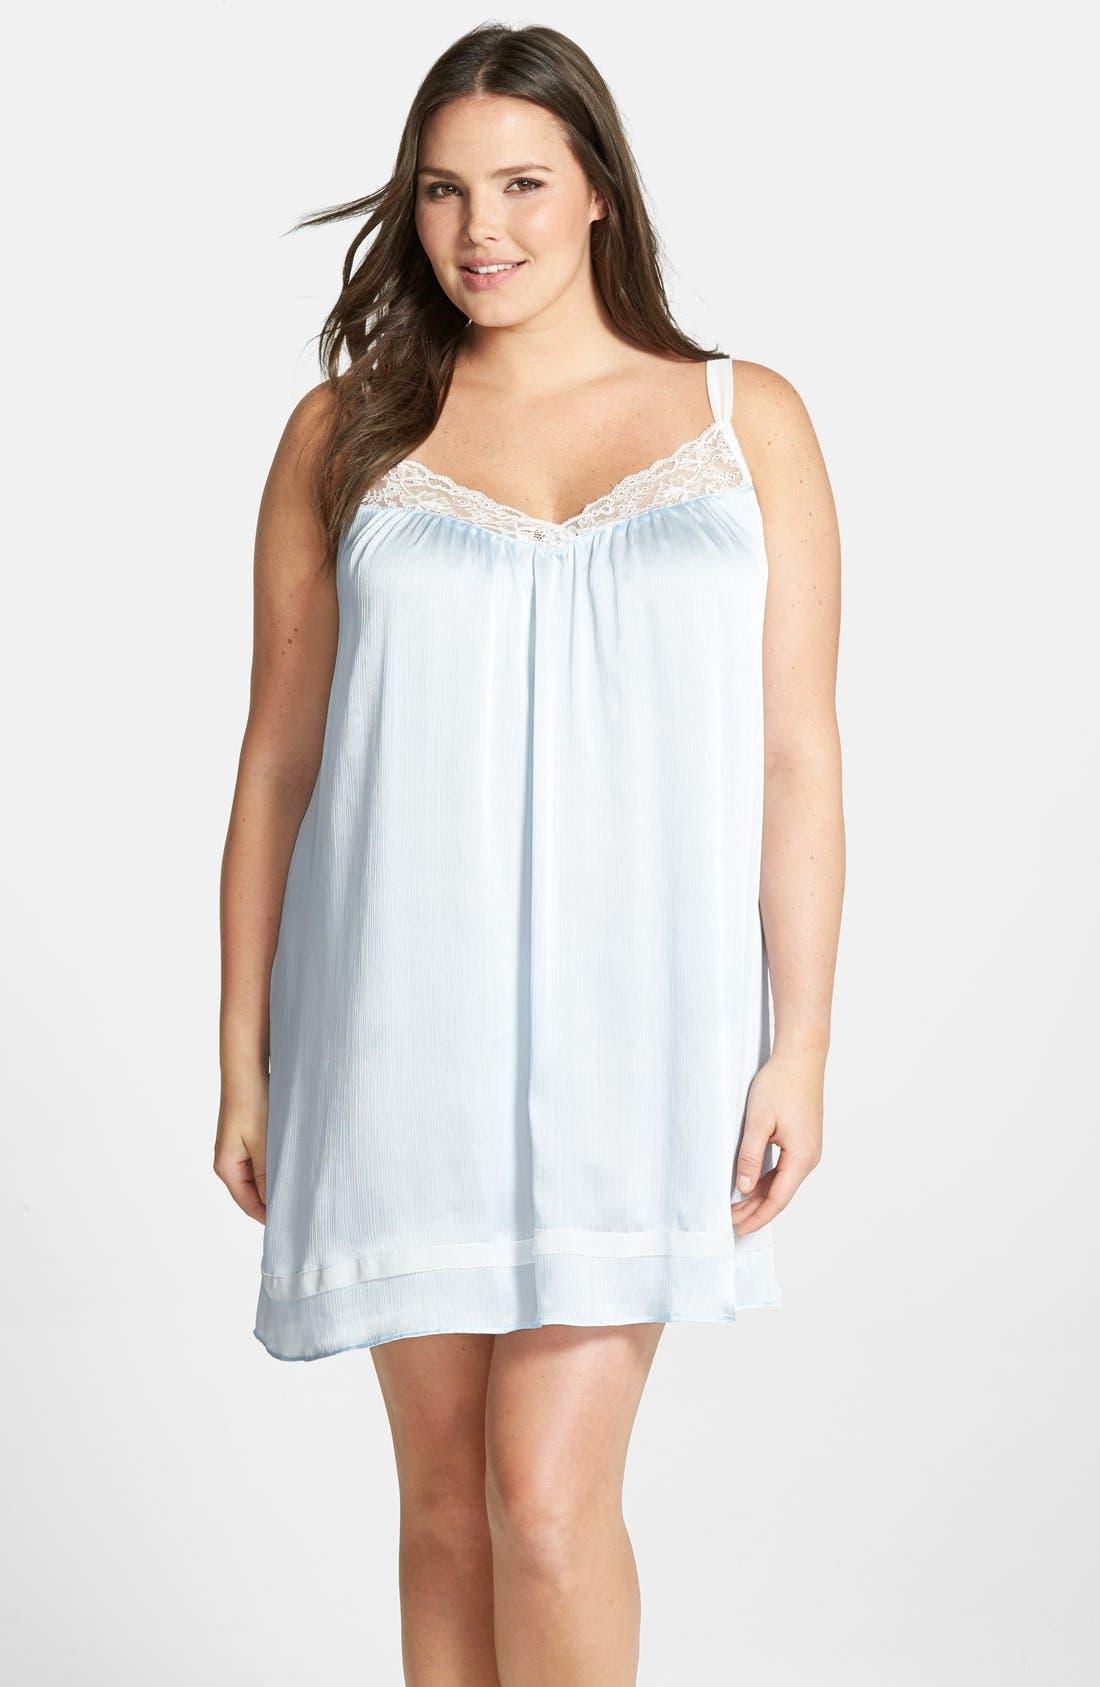 Alternate Image 1 Selected - Oscar de la Renta Sleepwear 'Classic Mix' Lace Trim Satin Chemise (Plus Size)